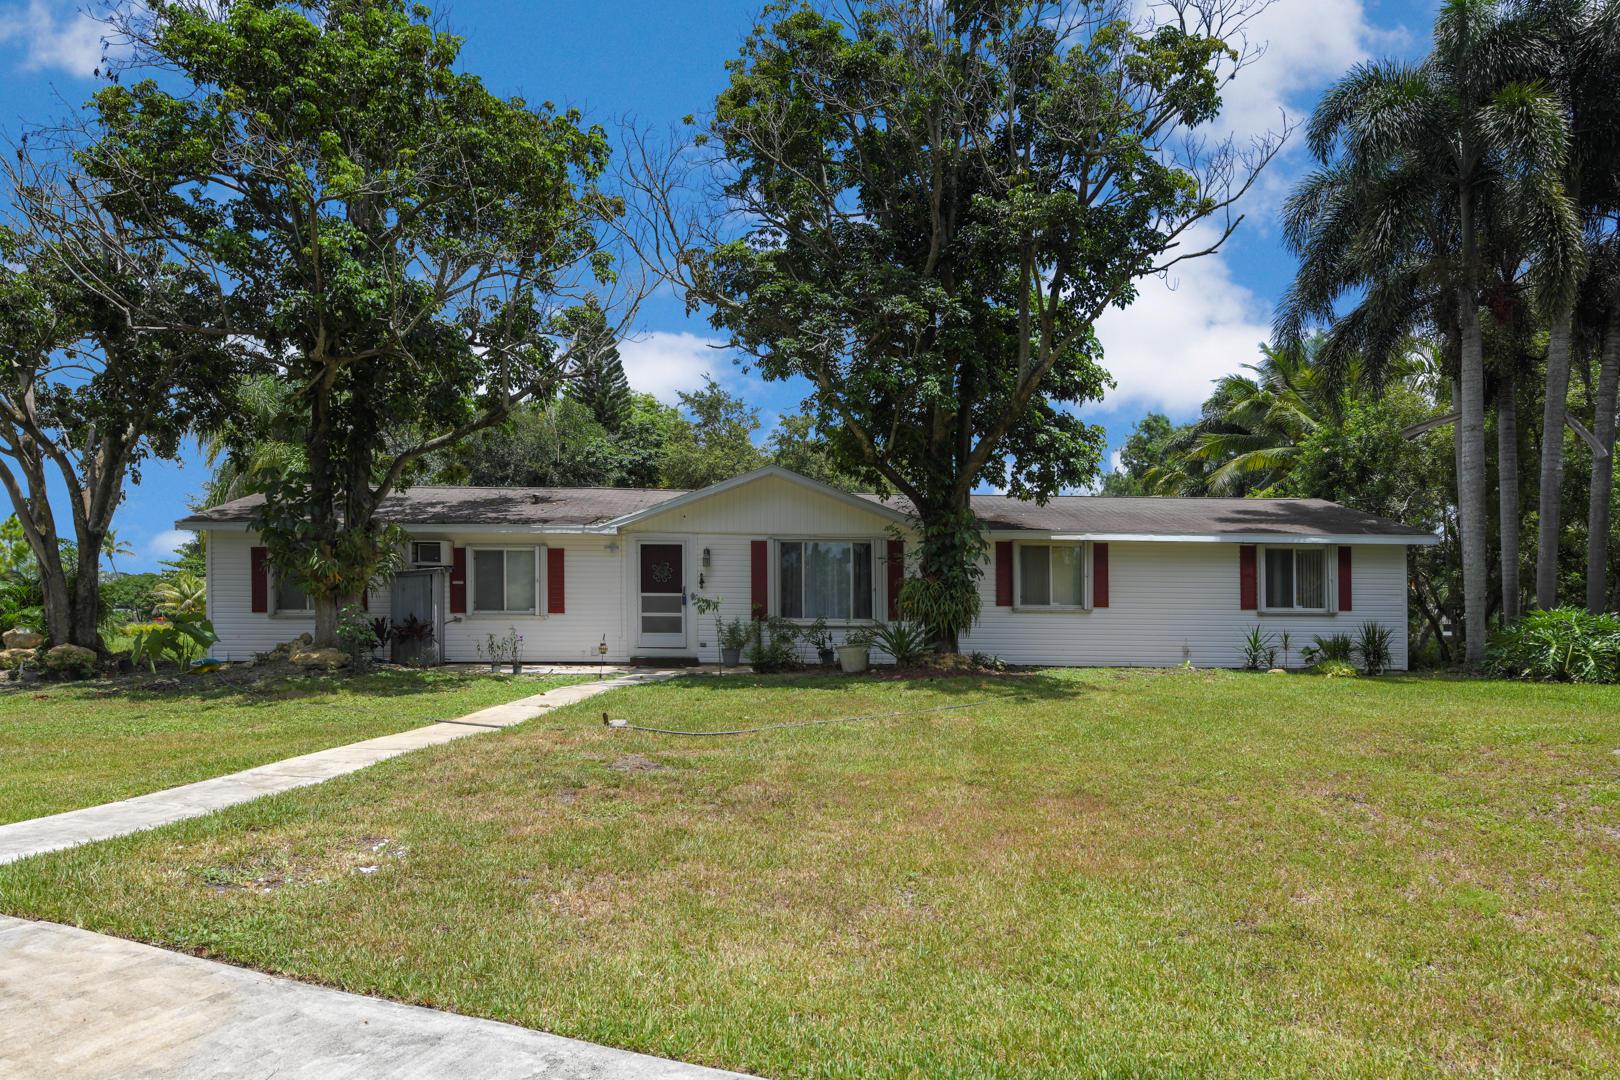 11255 Mellow Court The Acreage, FL 33470